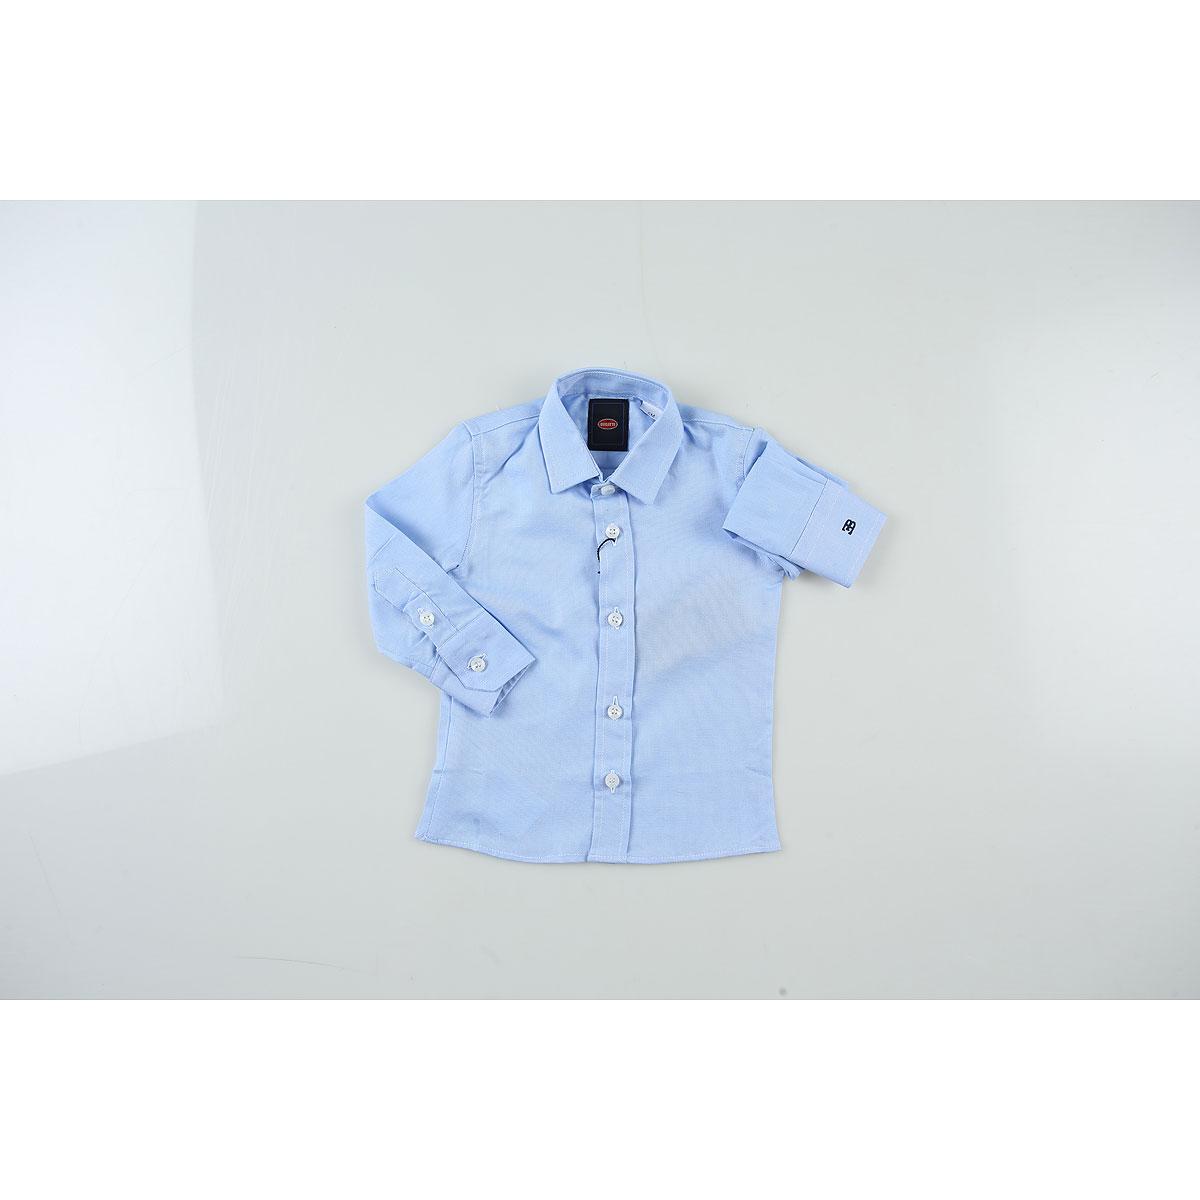 Image of Bugatti Baby Shirts for Boys, Light Blue, Cotton, 2017, 12M 18M 6M 9M